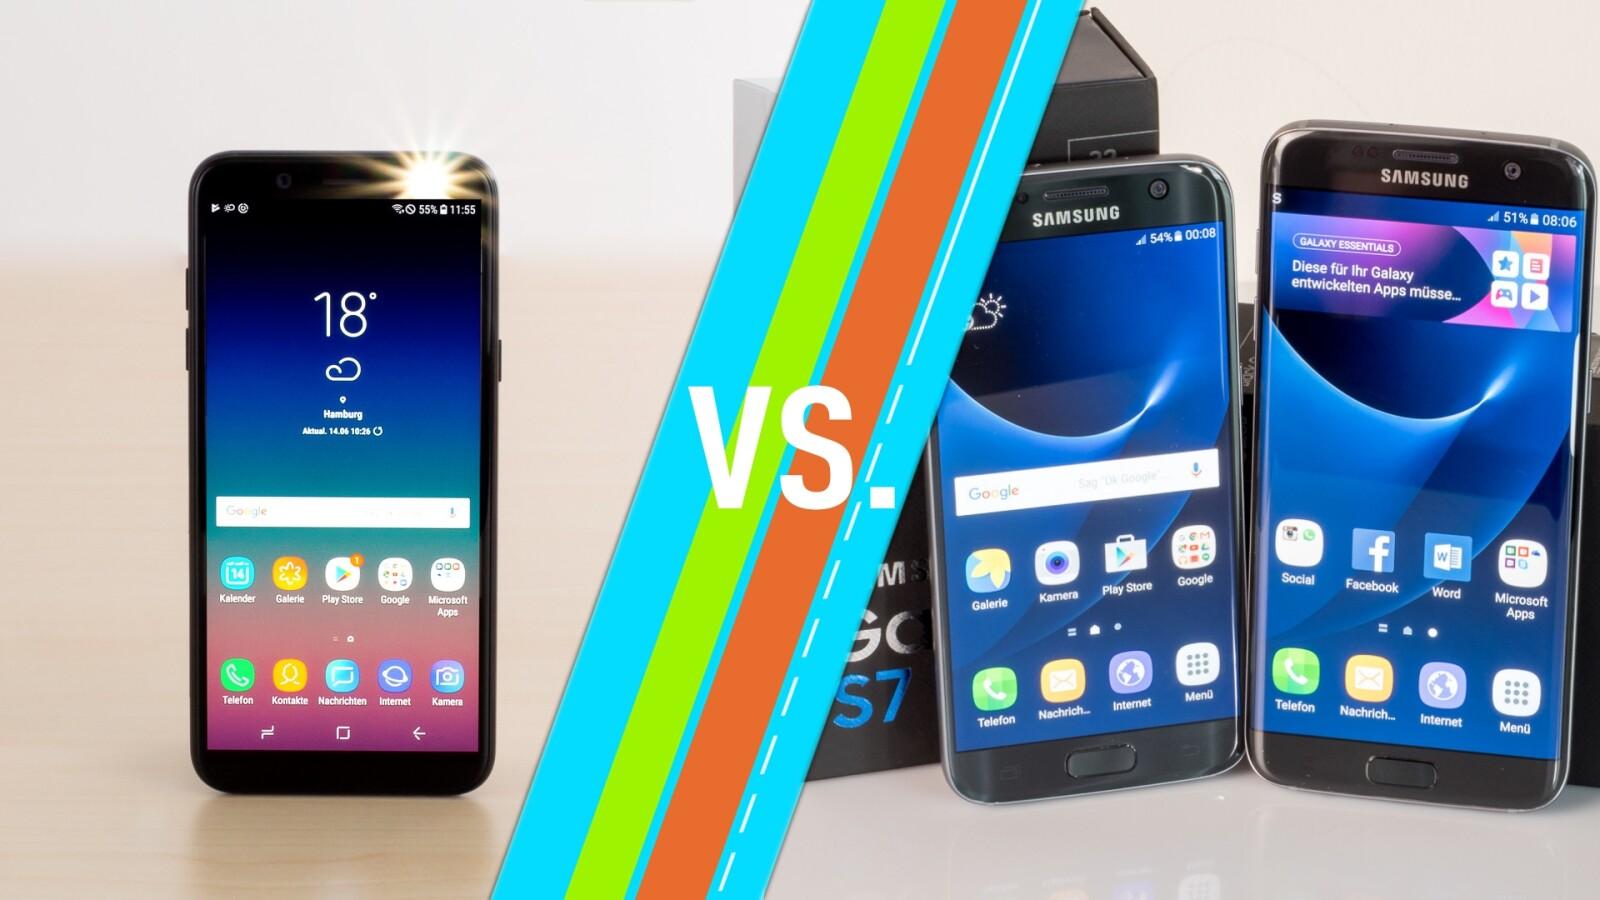 galaxy a6 2018 vs galaxy s7 edge samsung smartphones im vergleich netzwelt. Black Bedroom Furniture Sets. Home Design Ideas